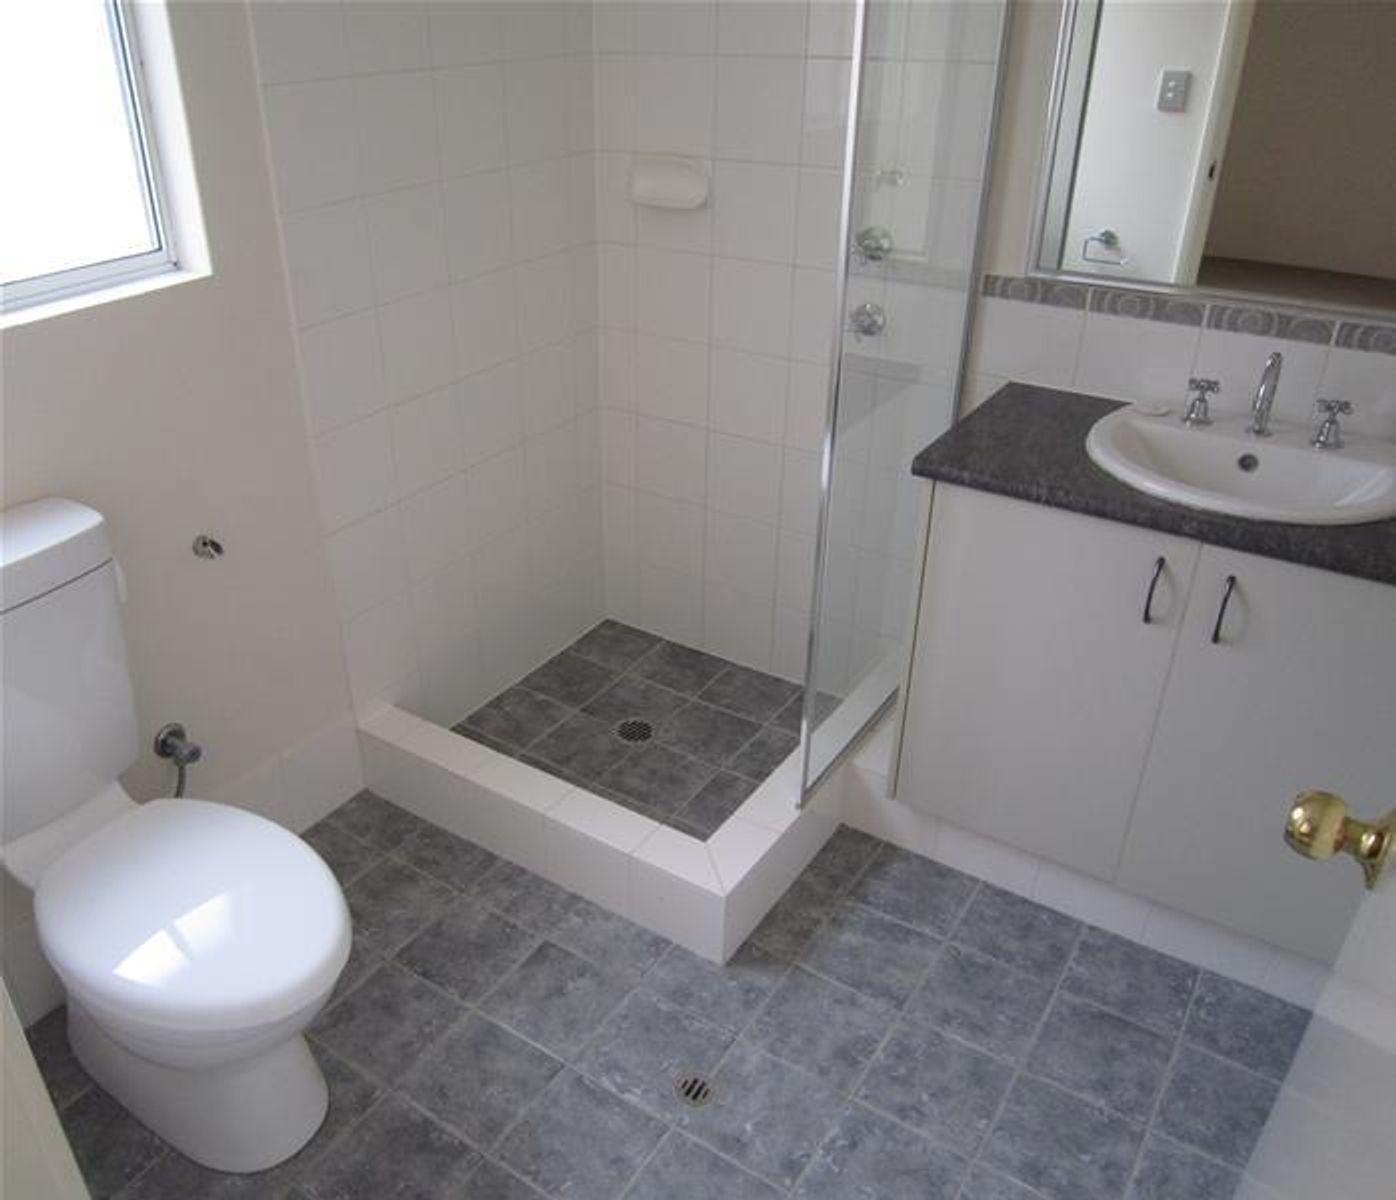 10 Lipari Terrace, Canning Vale, WA 6155